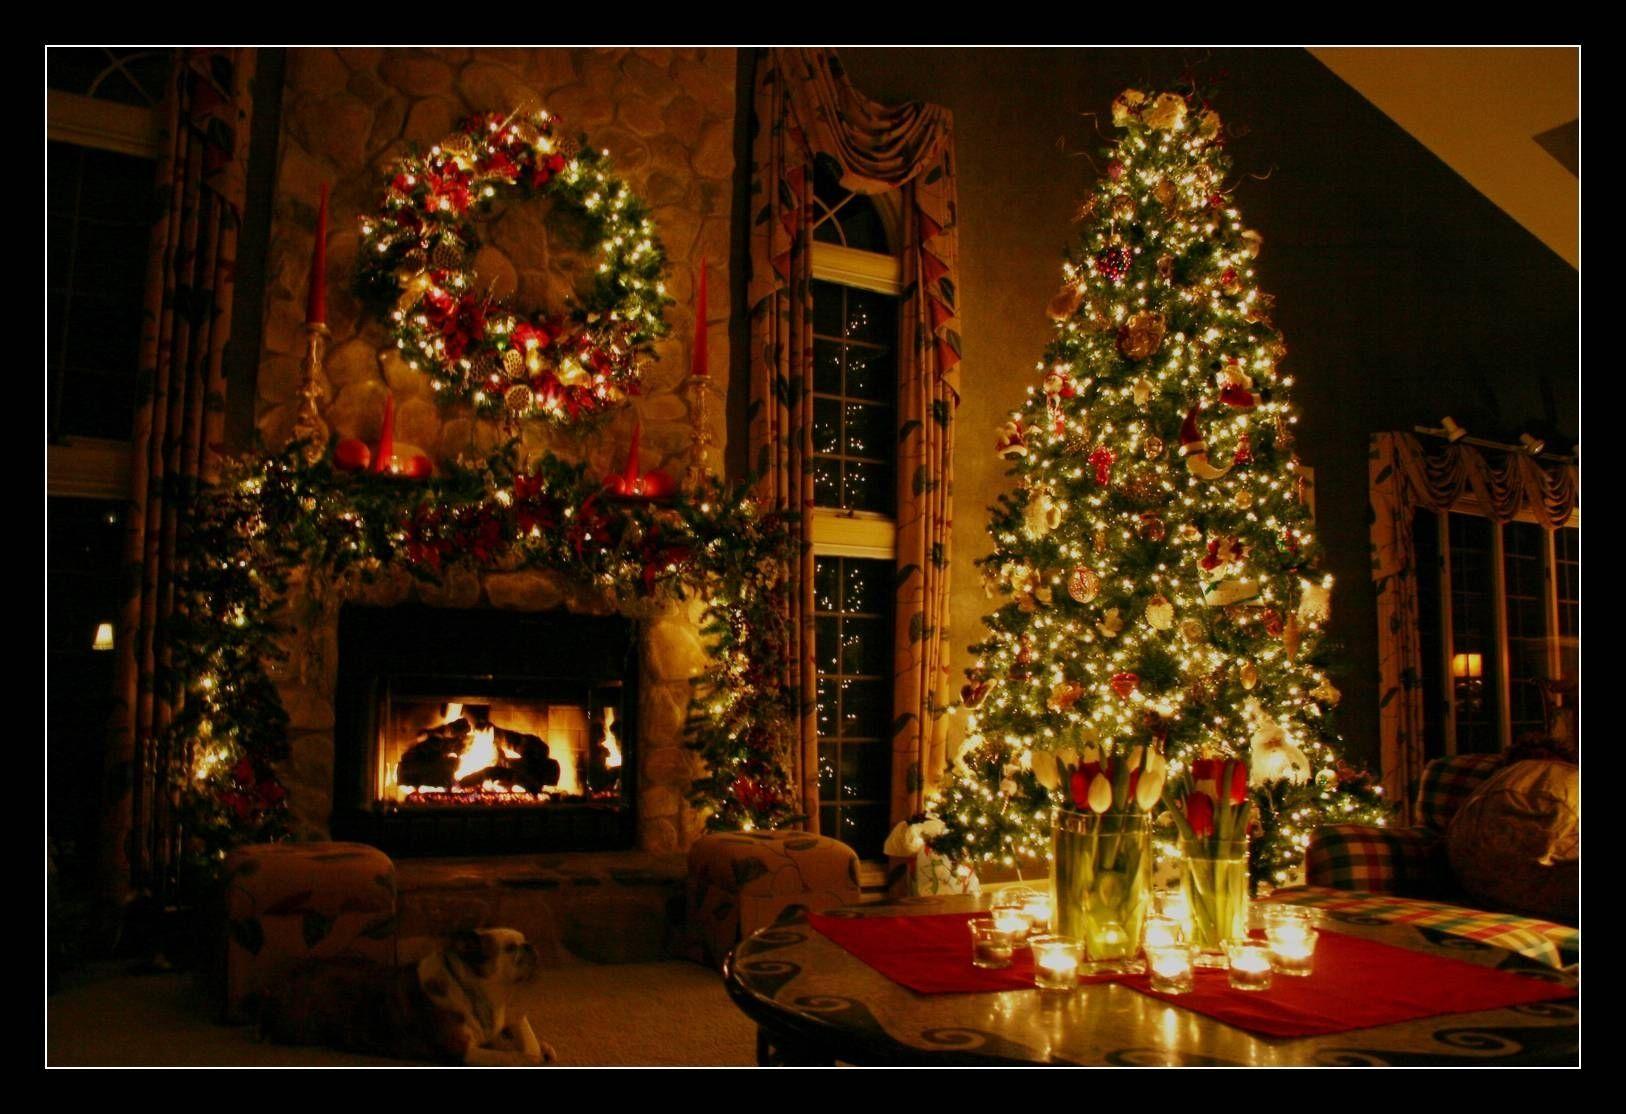 10 Best Christmas Fireplace Desktop Wallpaper Full Hd 1080p For Pc Desktop Fun Christmas Decorations Christmas Wallpaper Christmas Fireplace